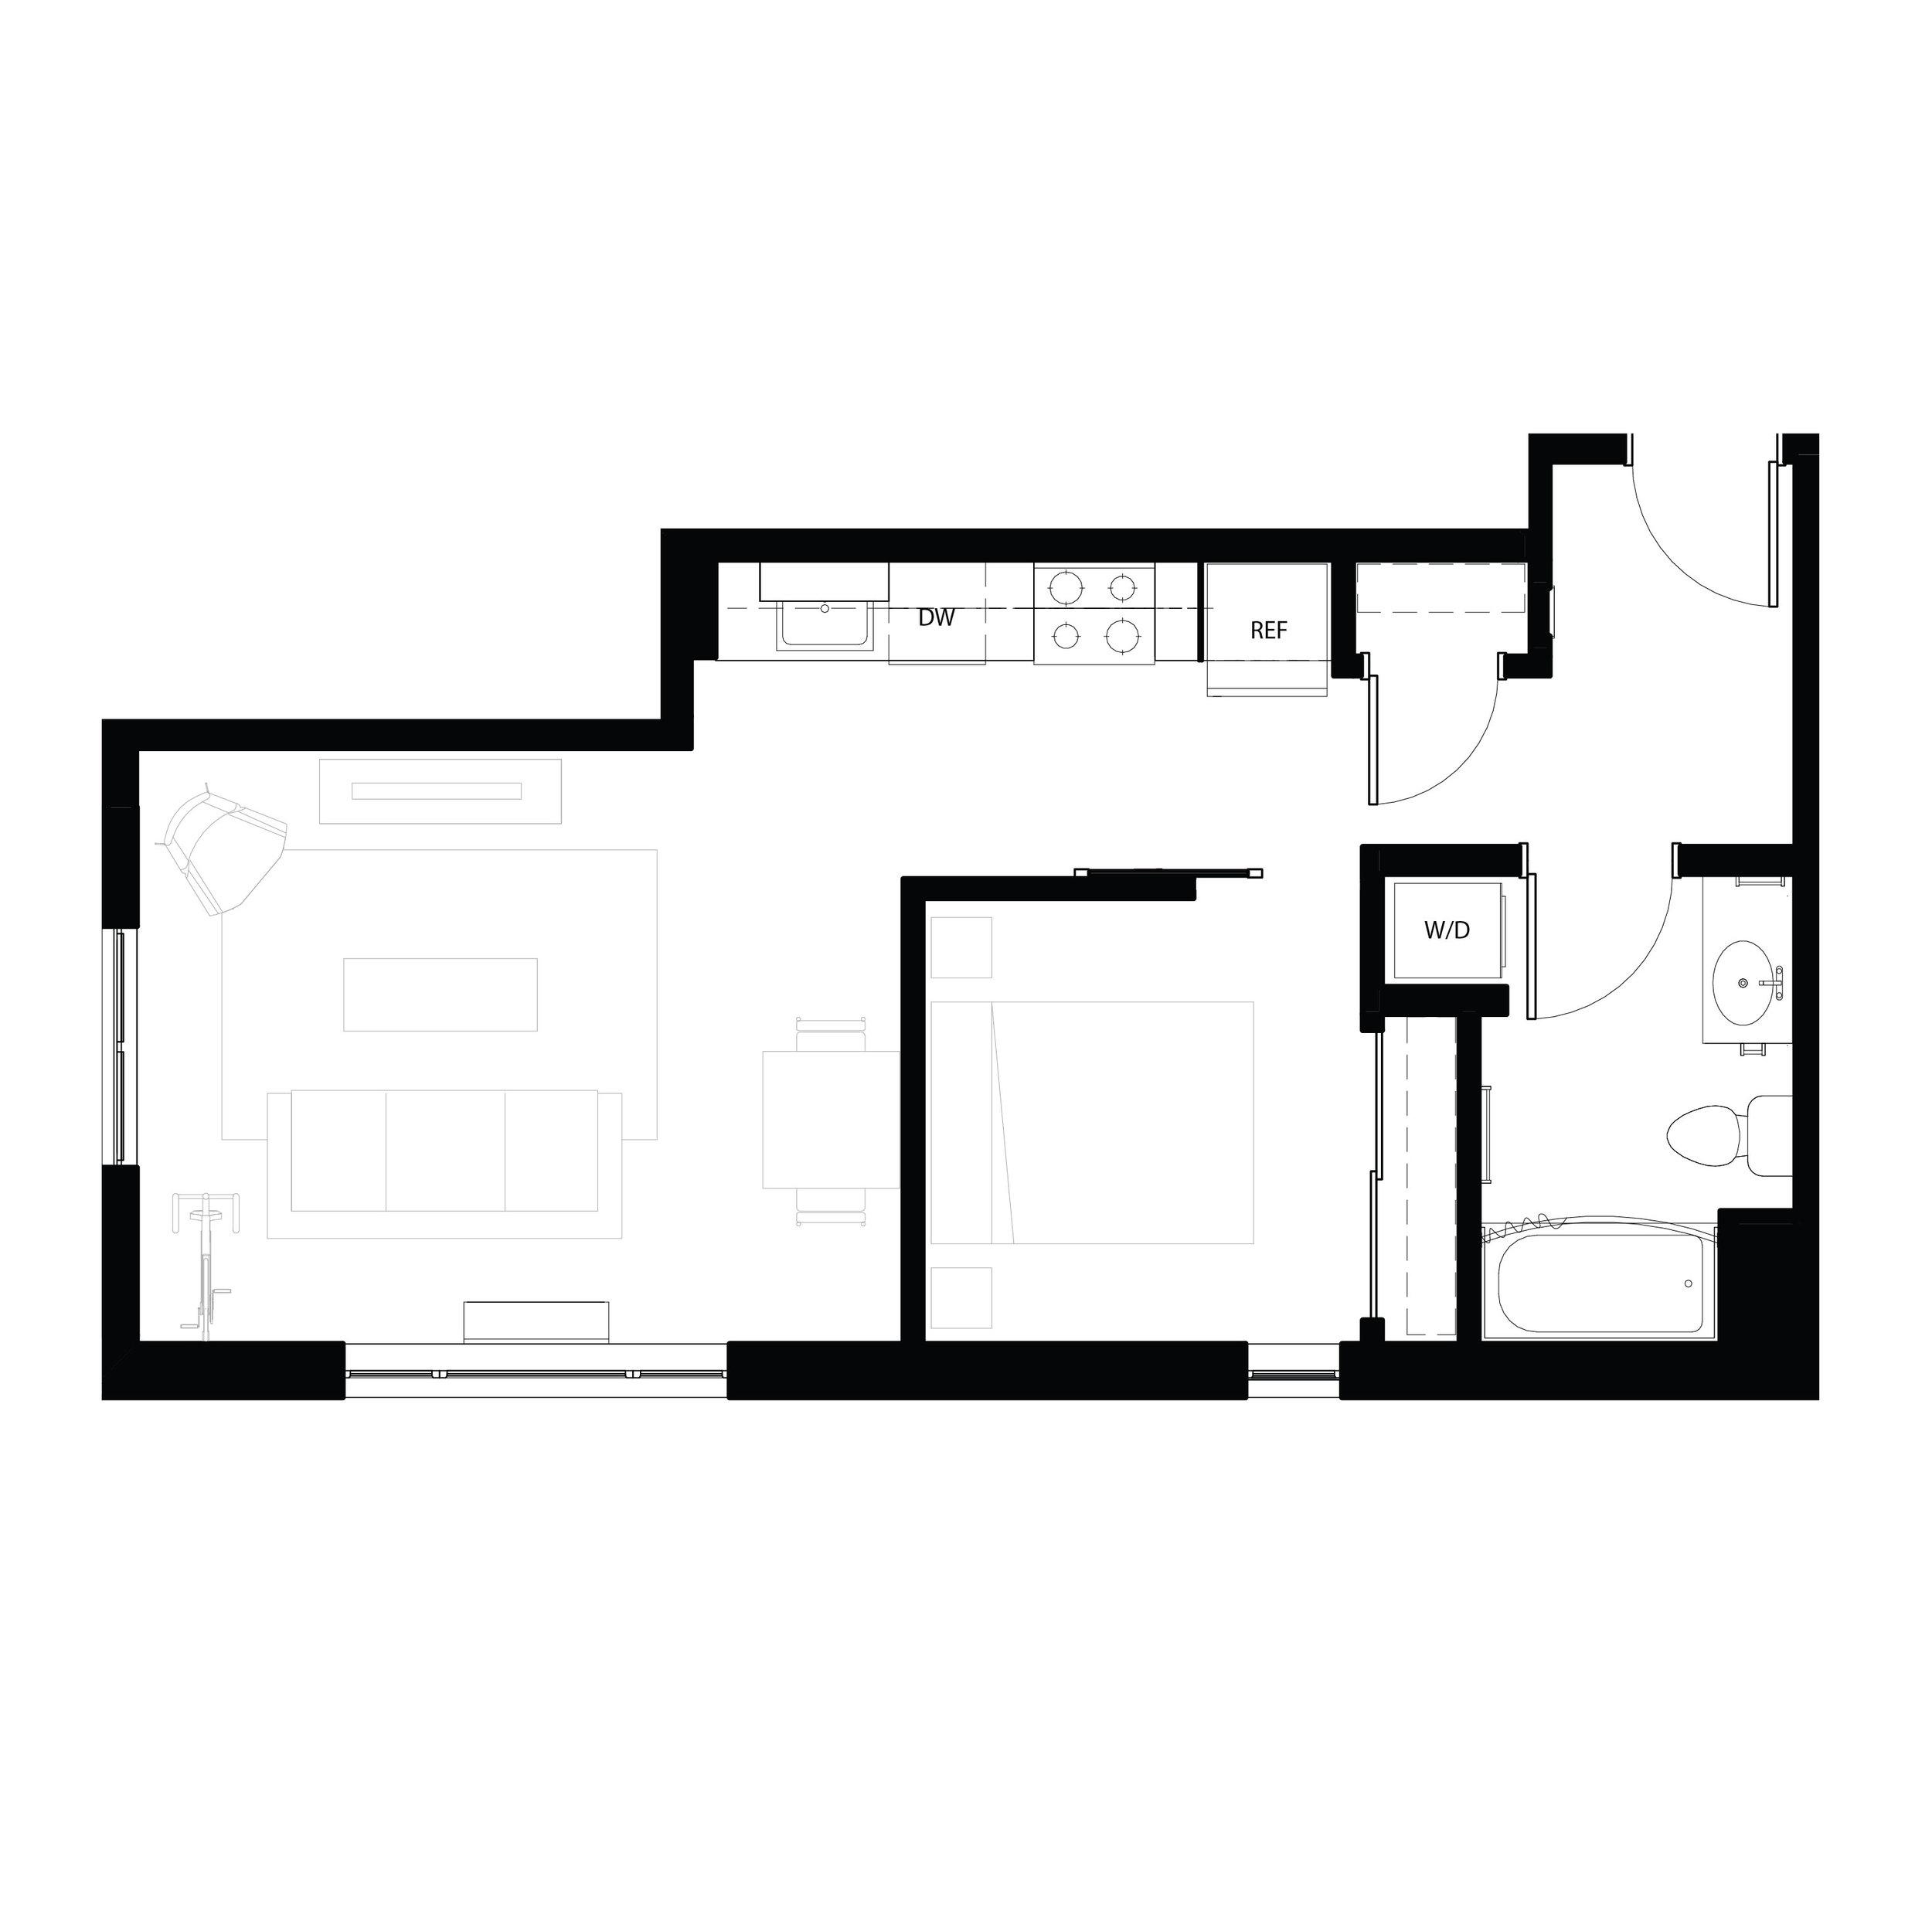 One bedroom 573 sq ft